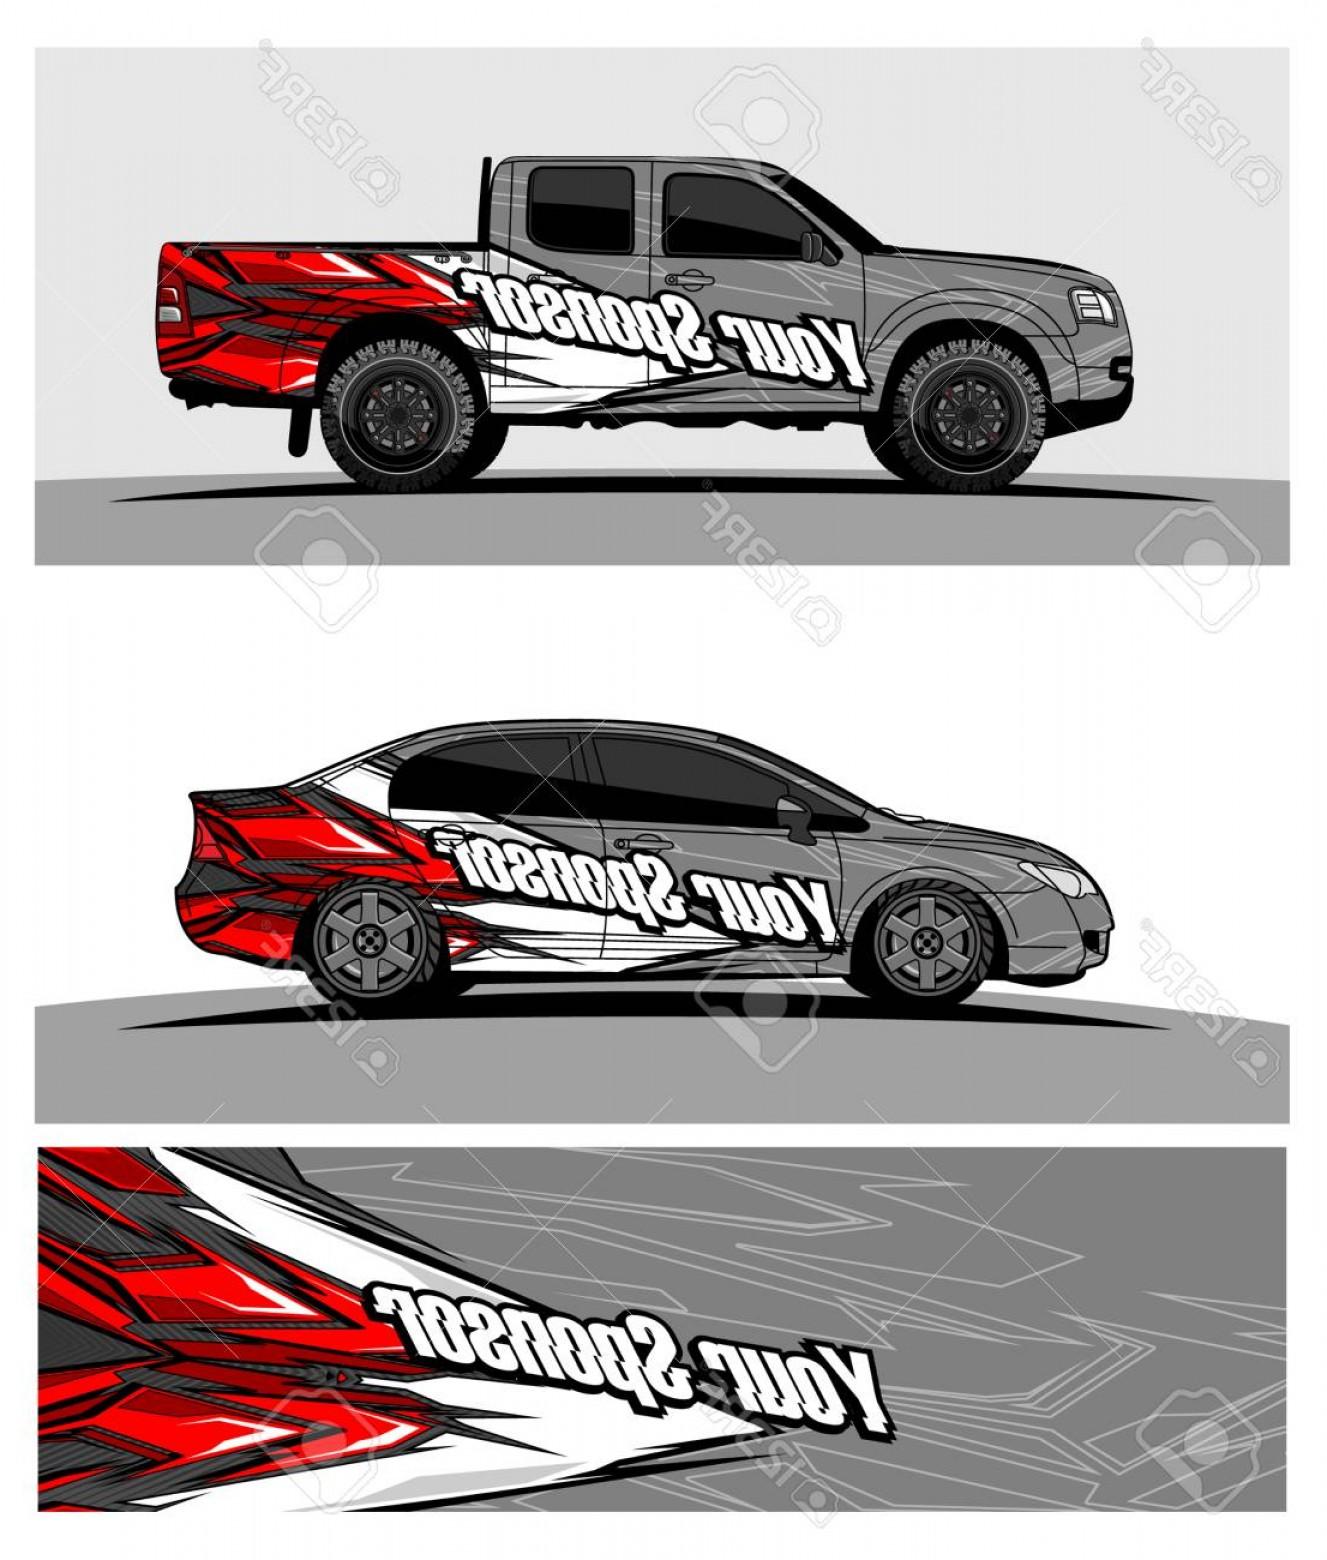 Photostock Vector Car Graphic Vector Abstract Racing Shape.